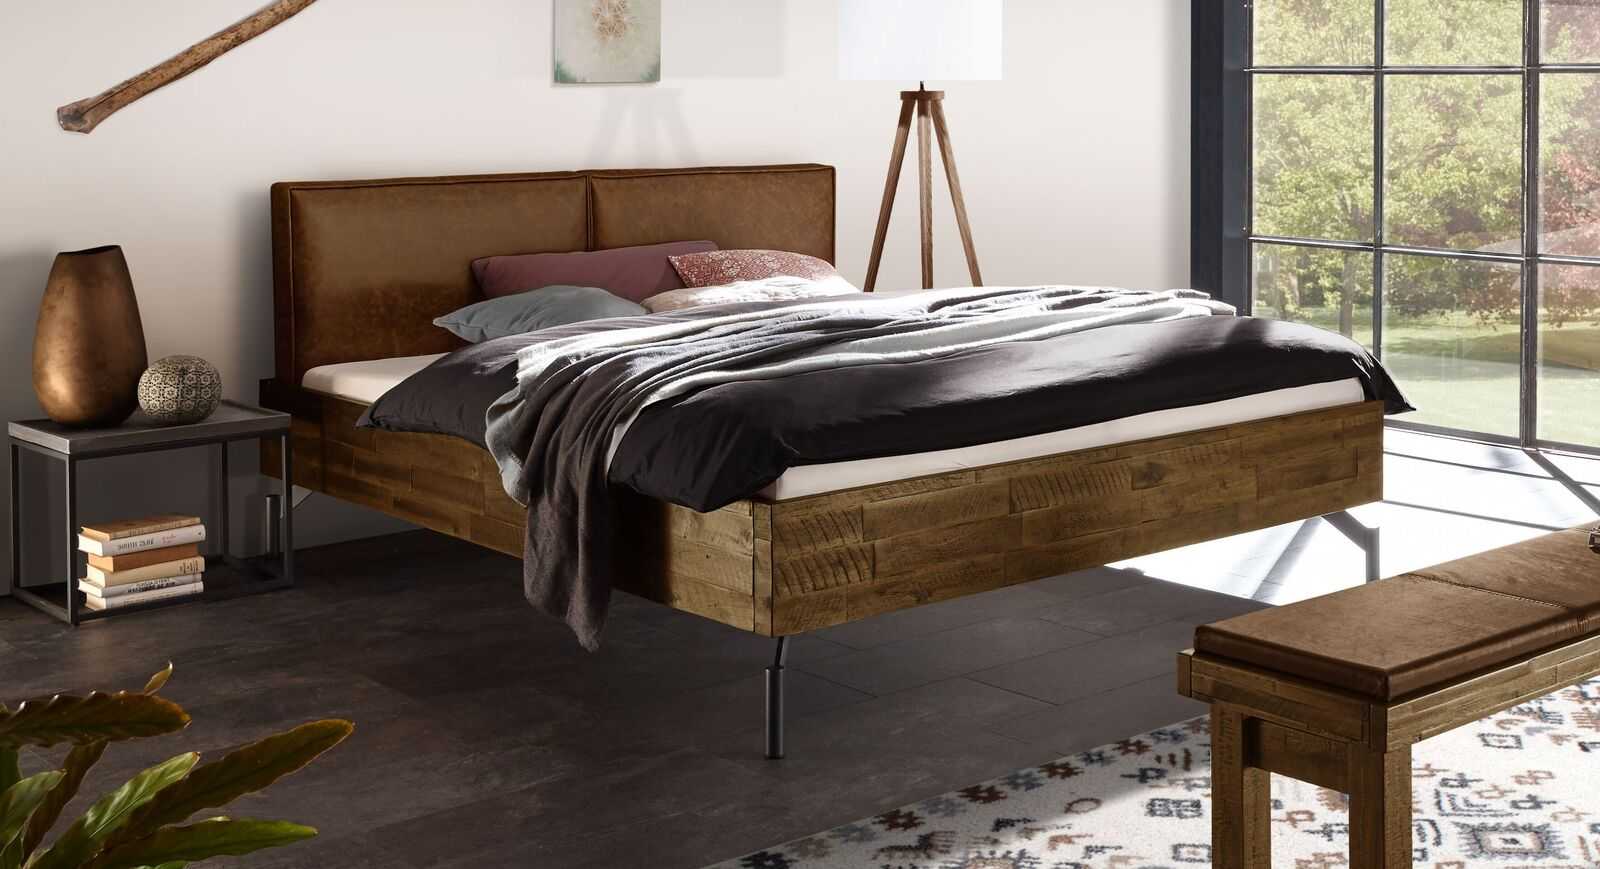 Braunes Bett Envigado mit ockerfarbenem Kopfteil